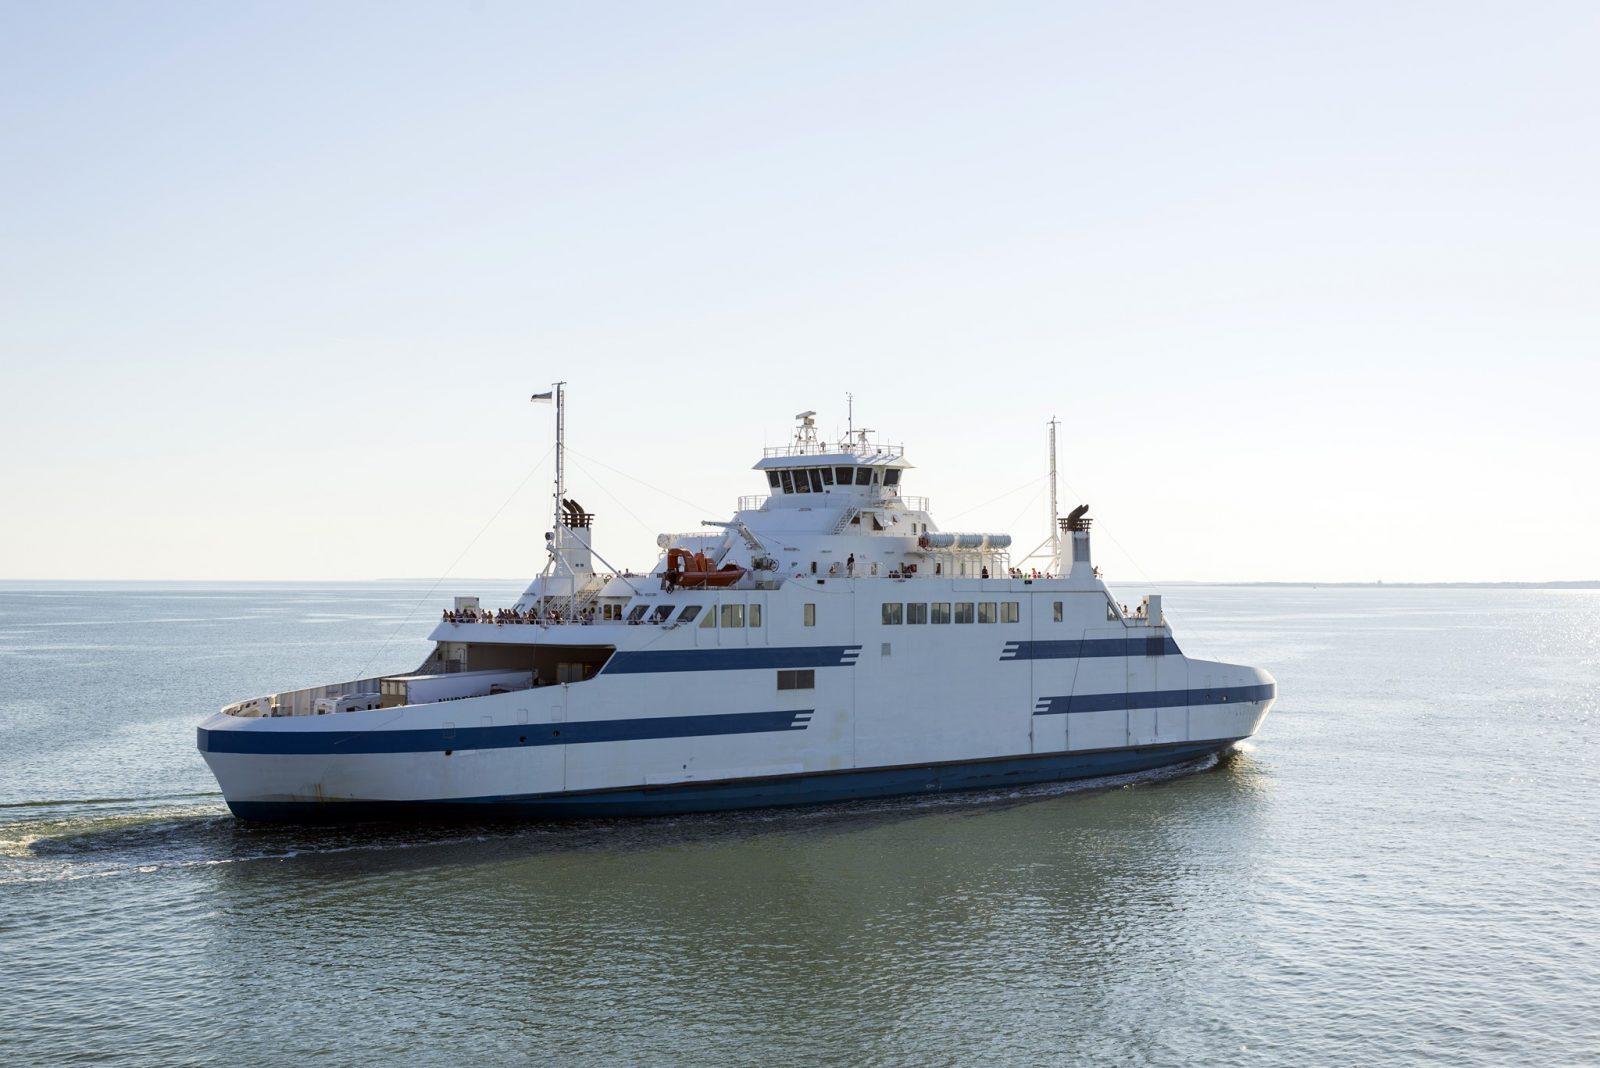 Le navire Saaremaa I sera de retour samedi